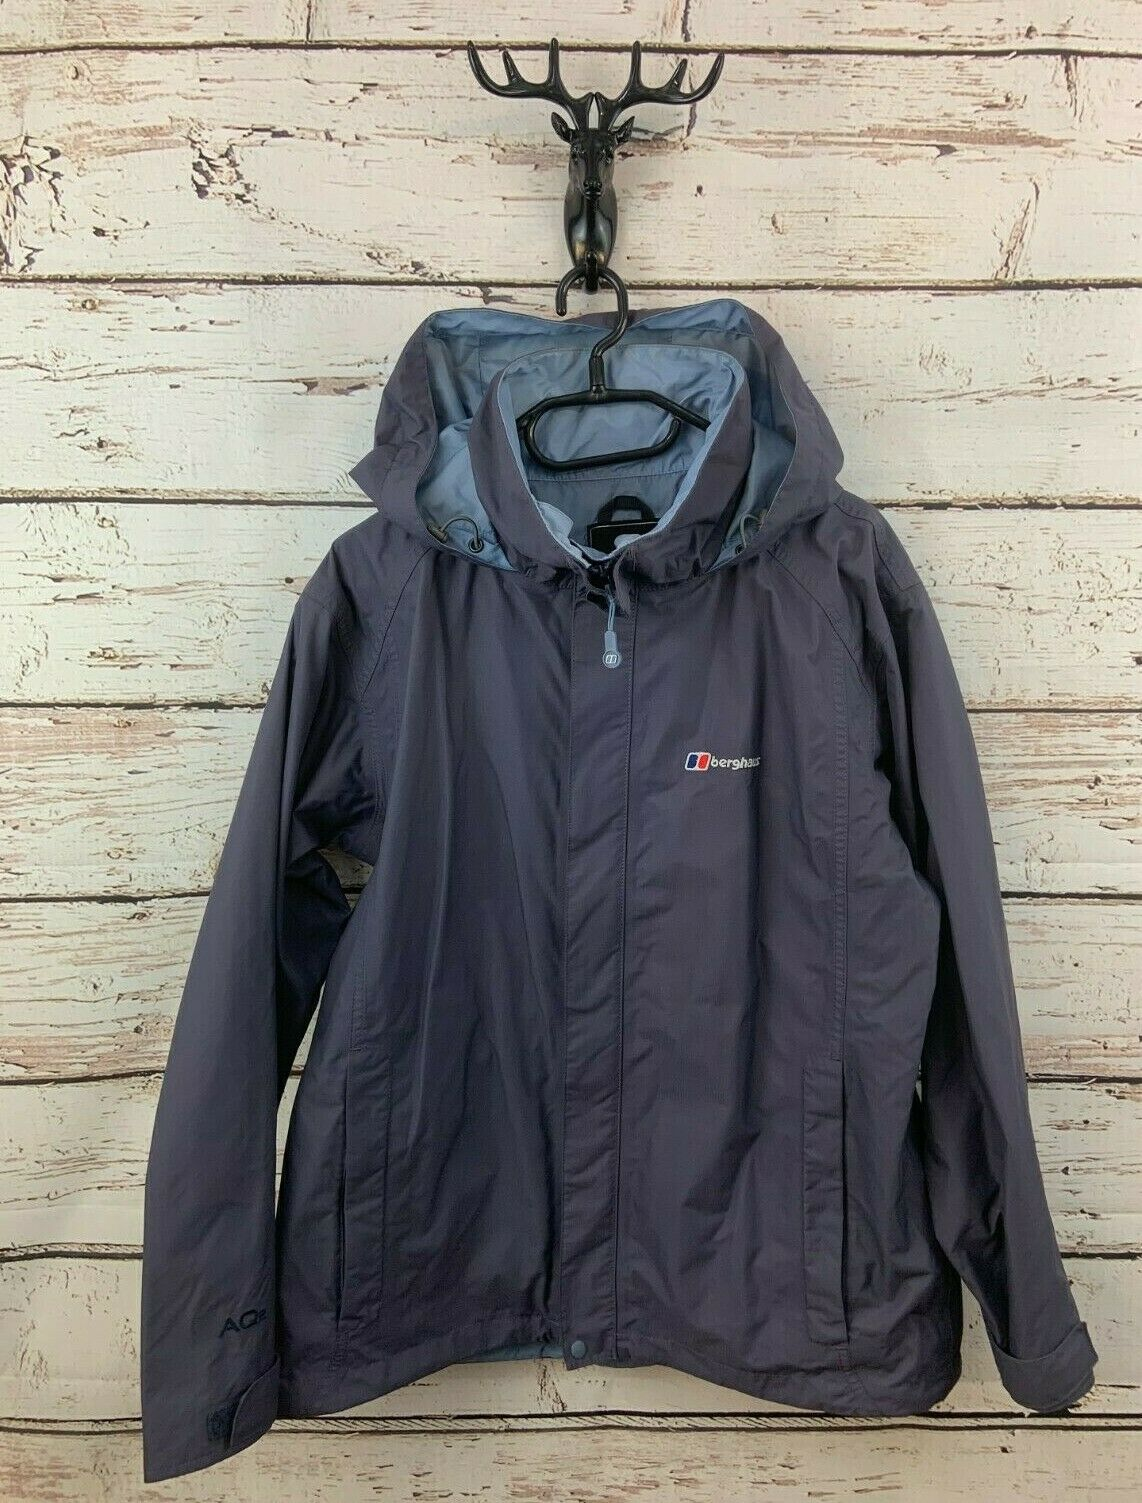 BERGHAUS Womens Jacket Coat 14 Purple Nylon Hooded